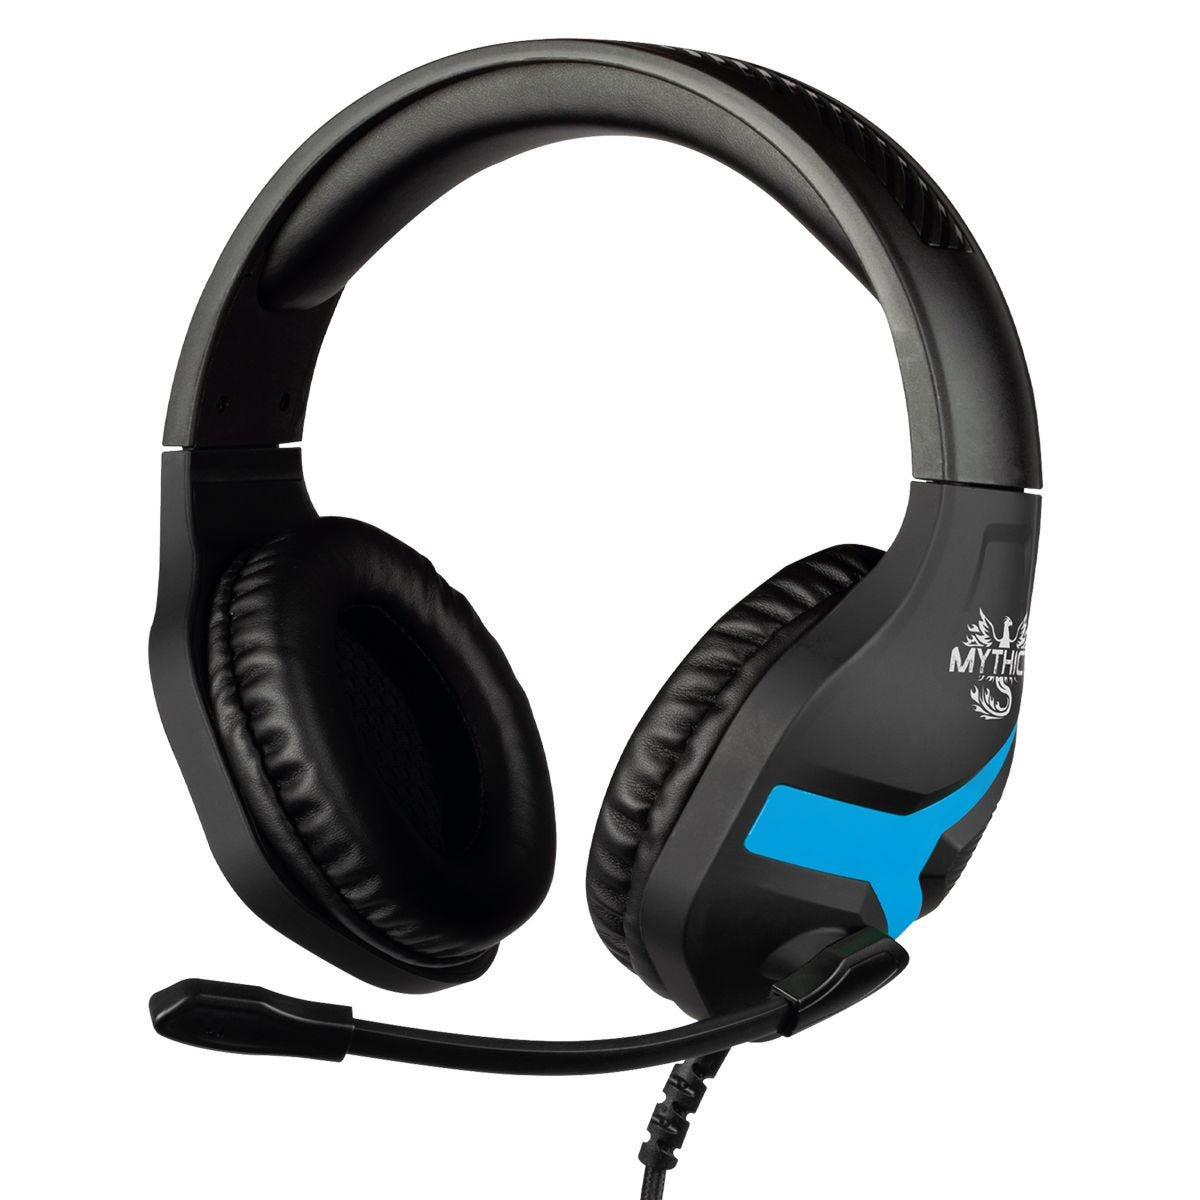 Konix Mythics Nemesis Gaming Headset - Black/Blue